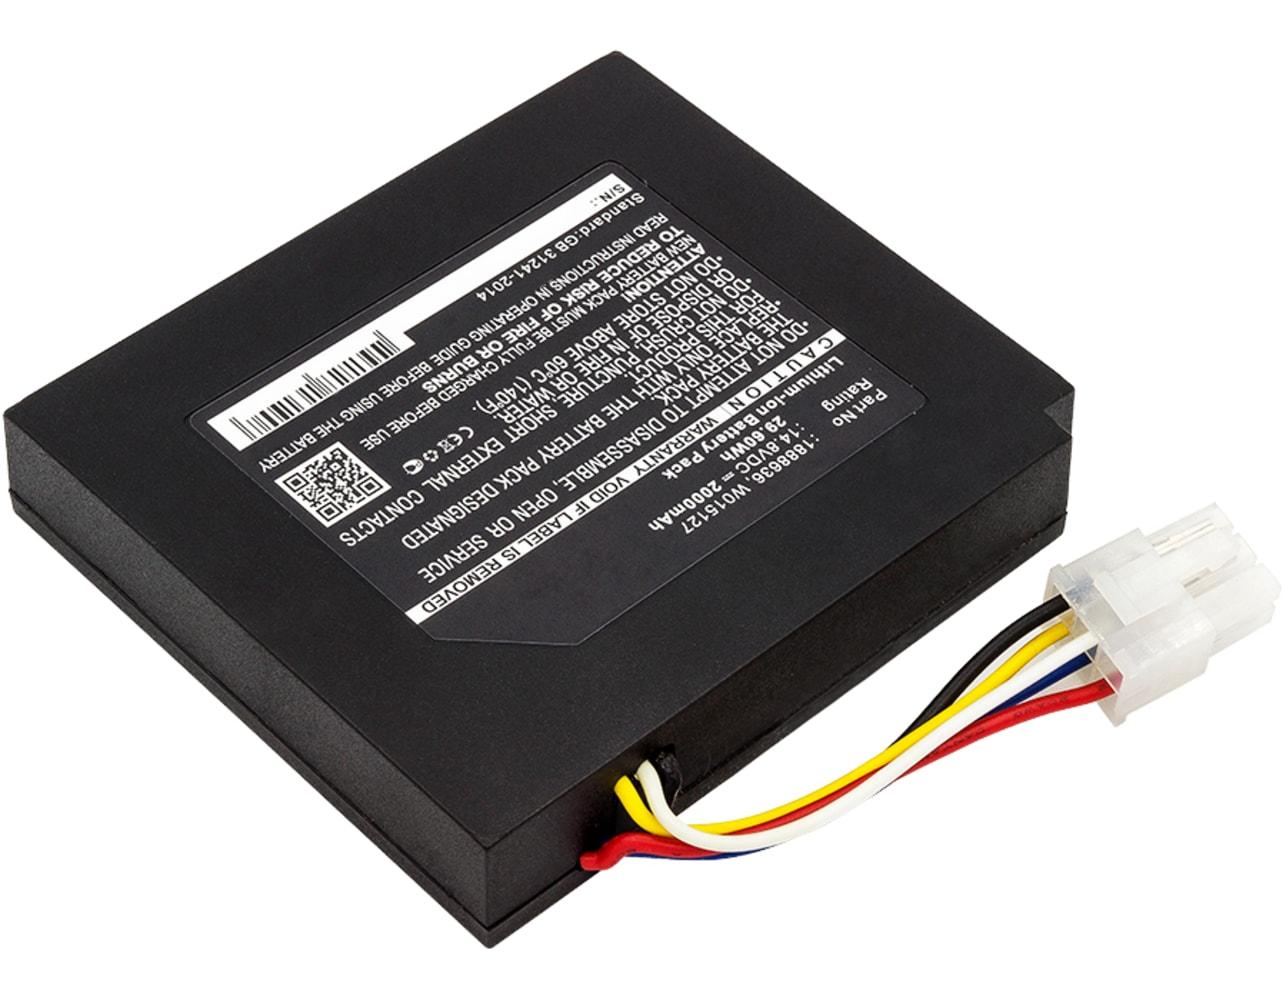 Batterie pour Dymo LabelManager 500TS LabelManager PnP Wireless MobileLabeler XTL 300 XTL 500 Label Maker - 1888636,634169A,W015127 2000mAh